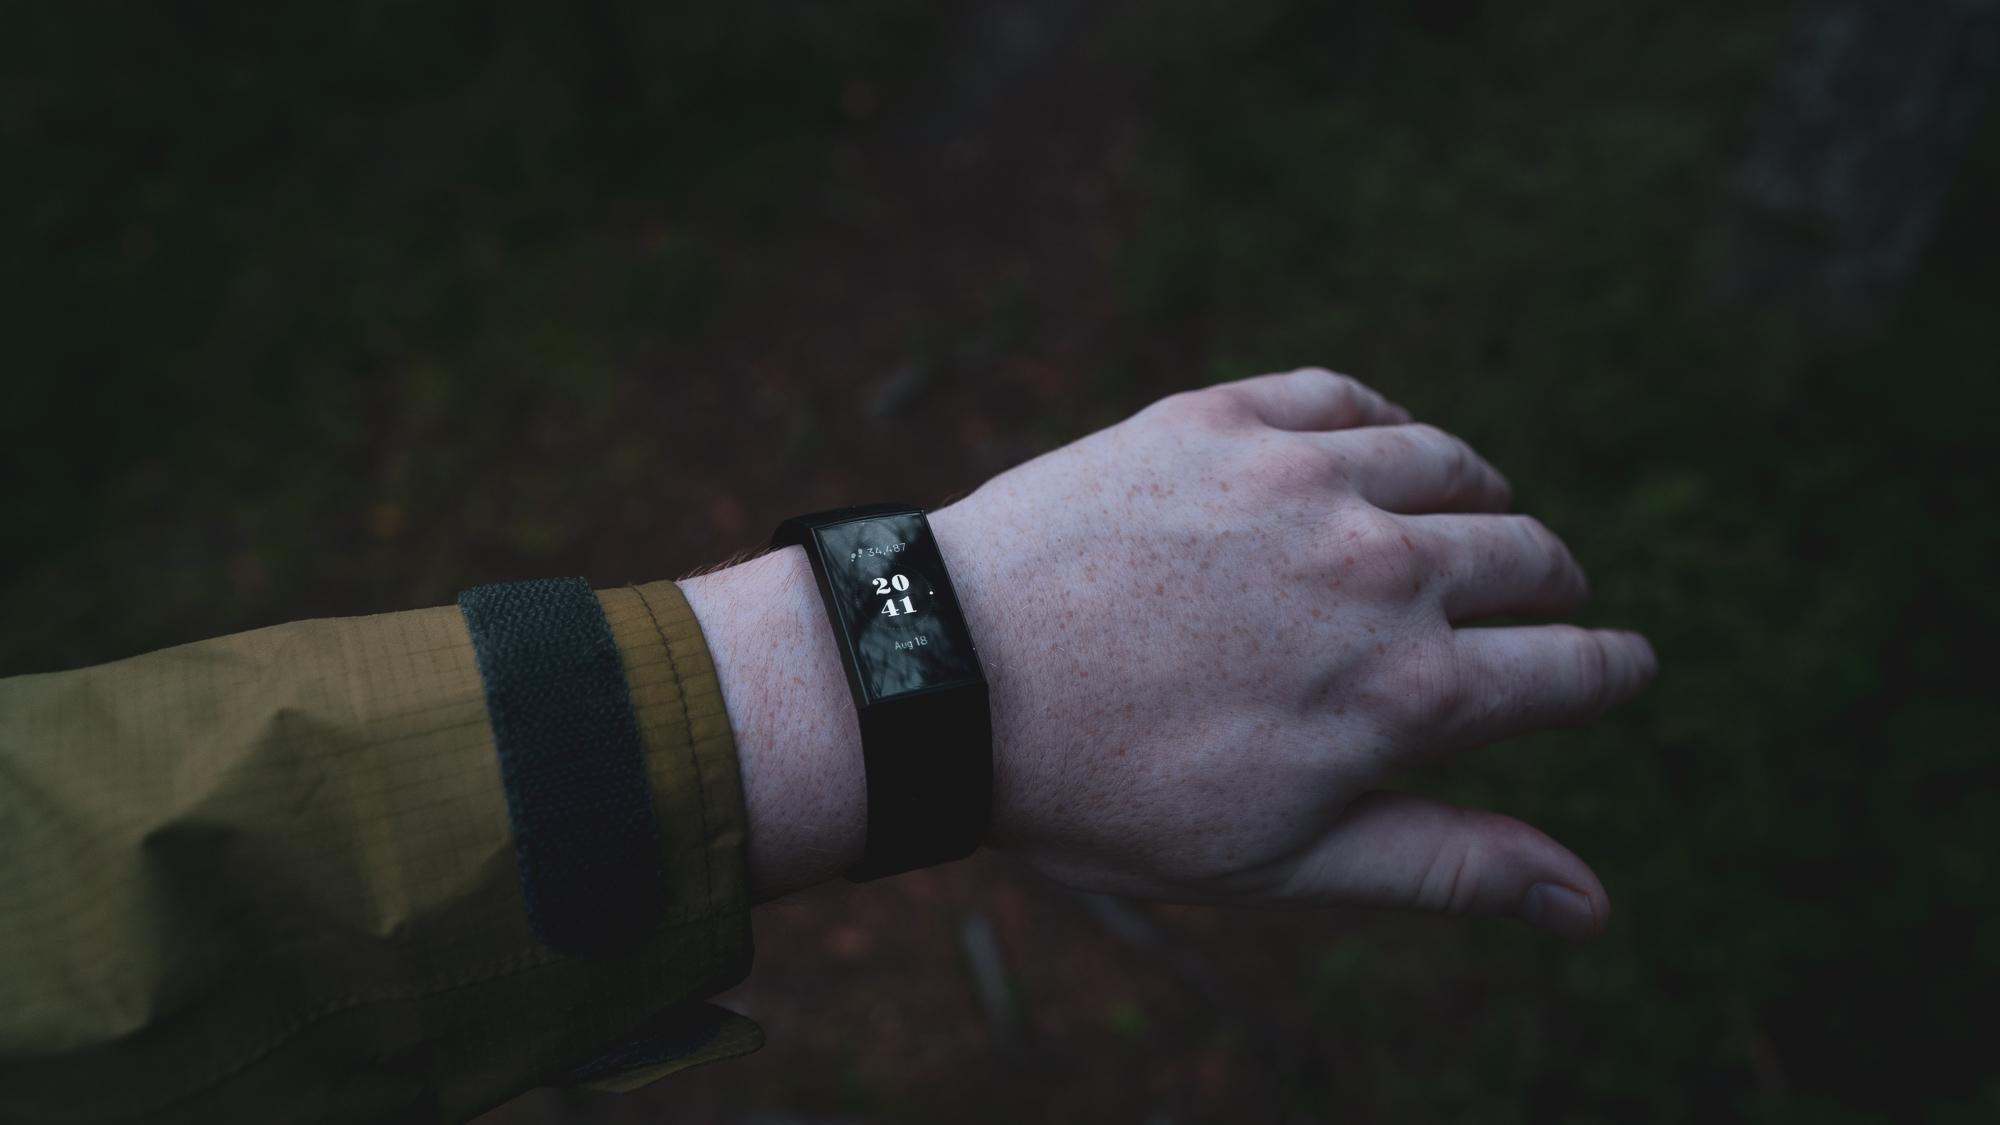 En hånd med en smartklokke.